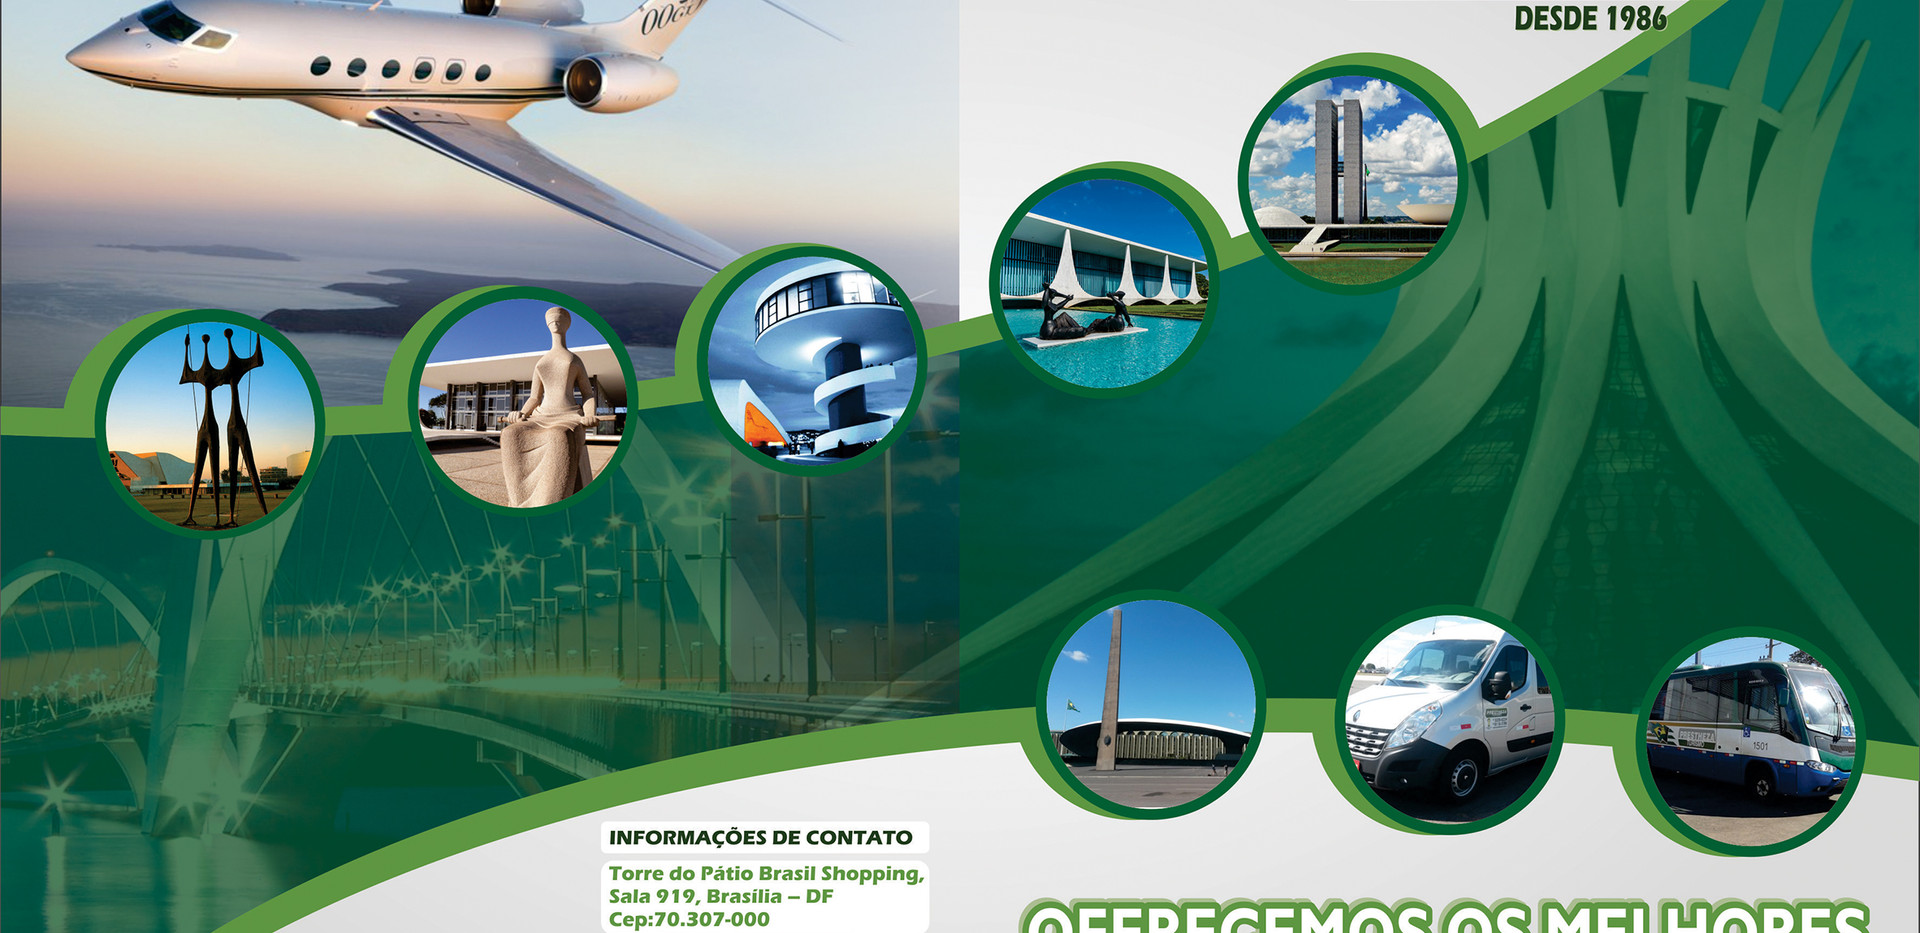 Folder Pretheza Turismo (NOVO) FRENTE 03